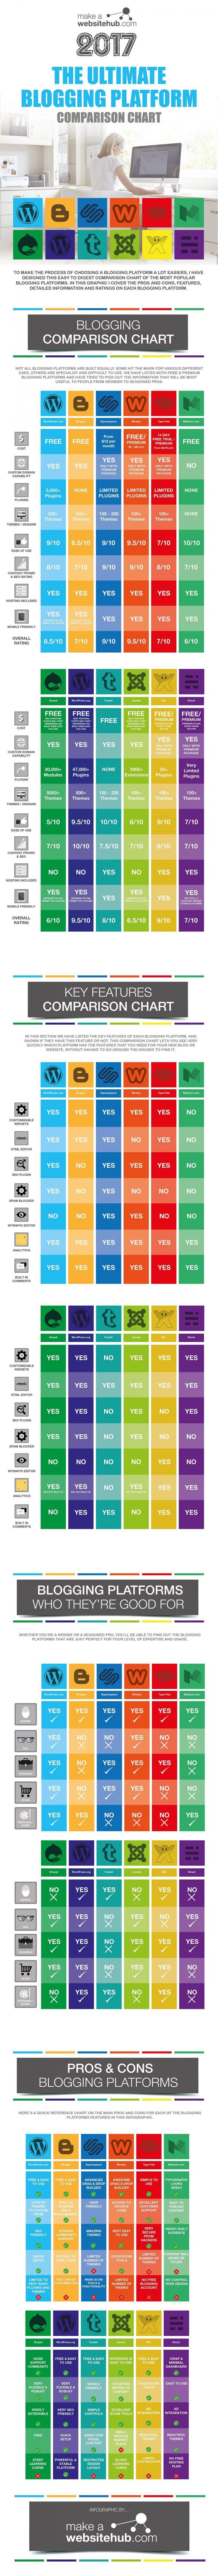 Comparison of Blogging Platforms